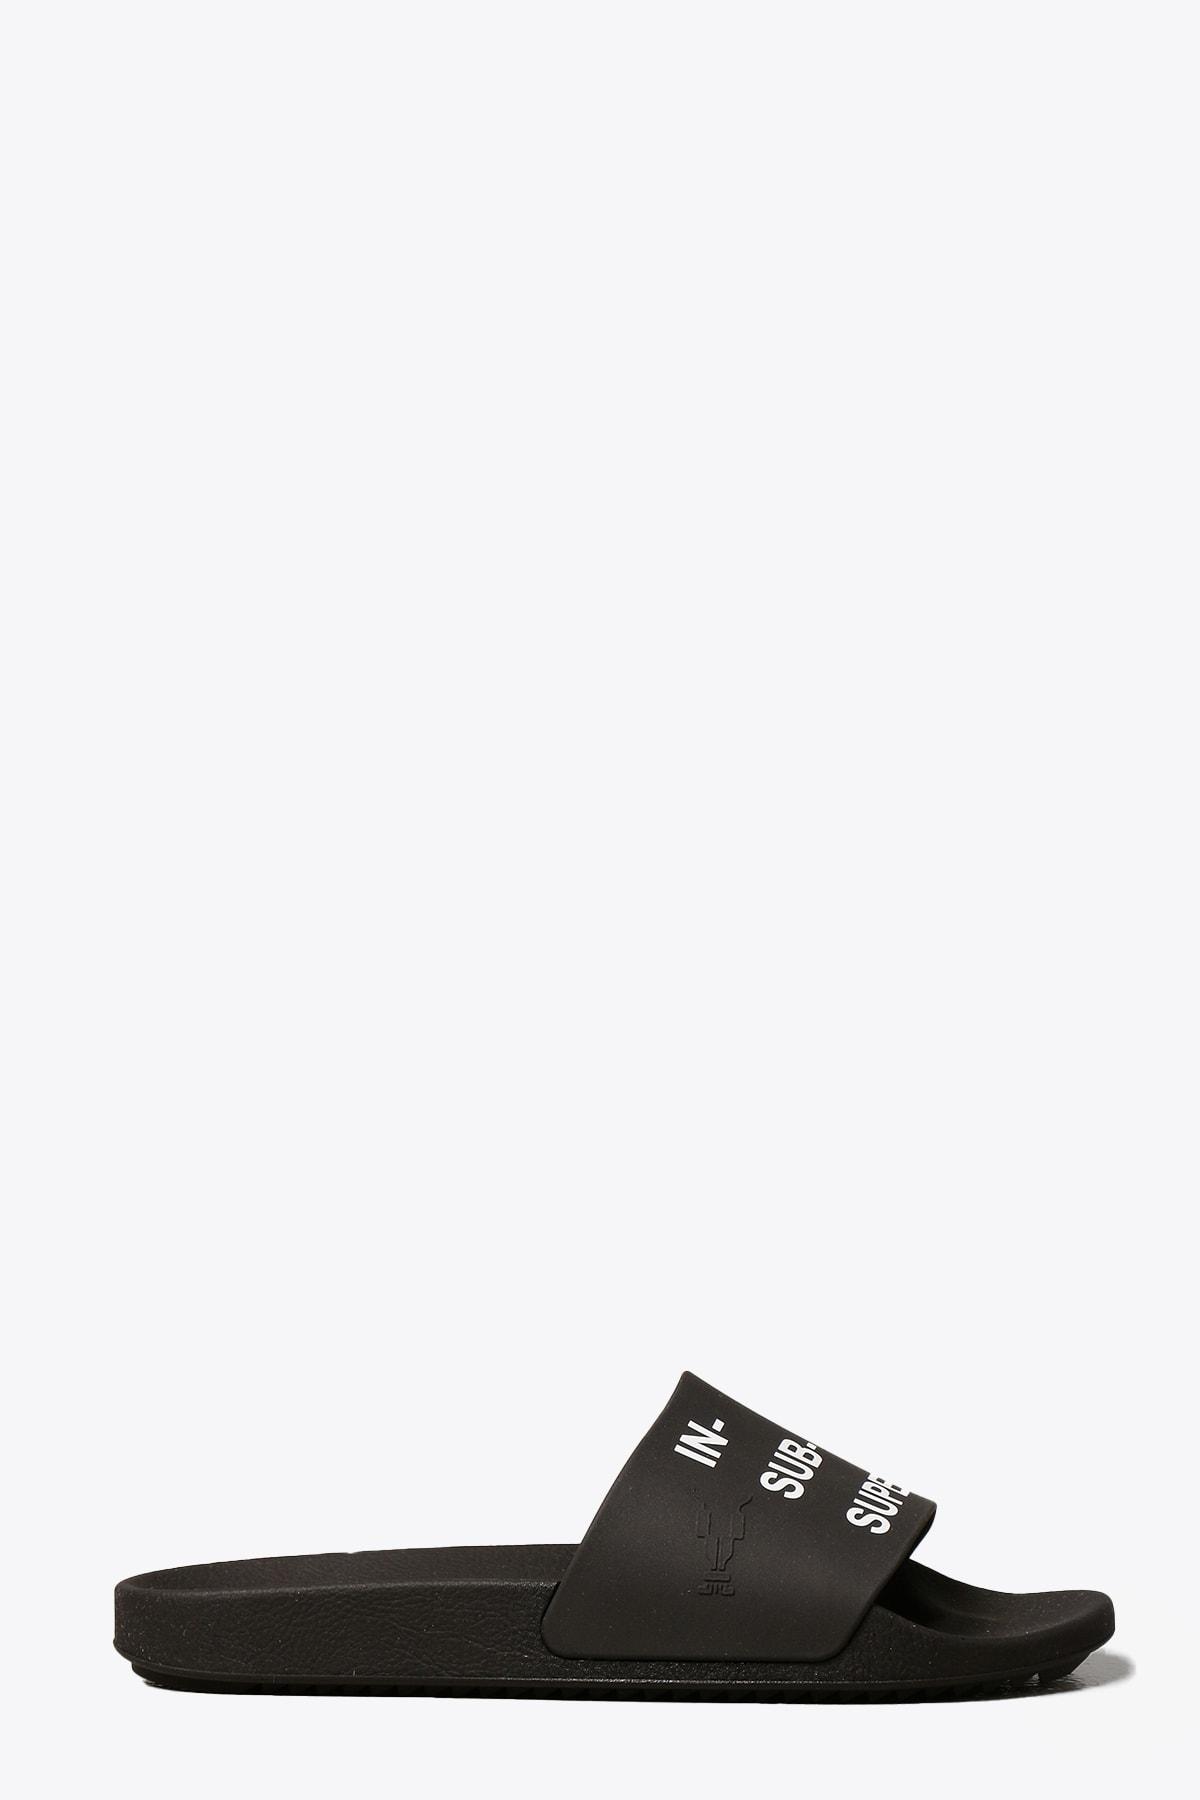 Black Rubber Slide With Slogan Print